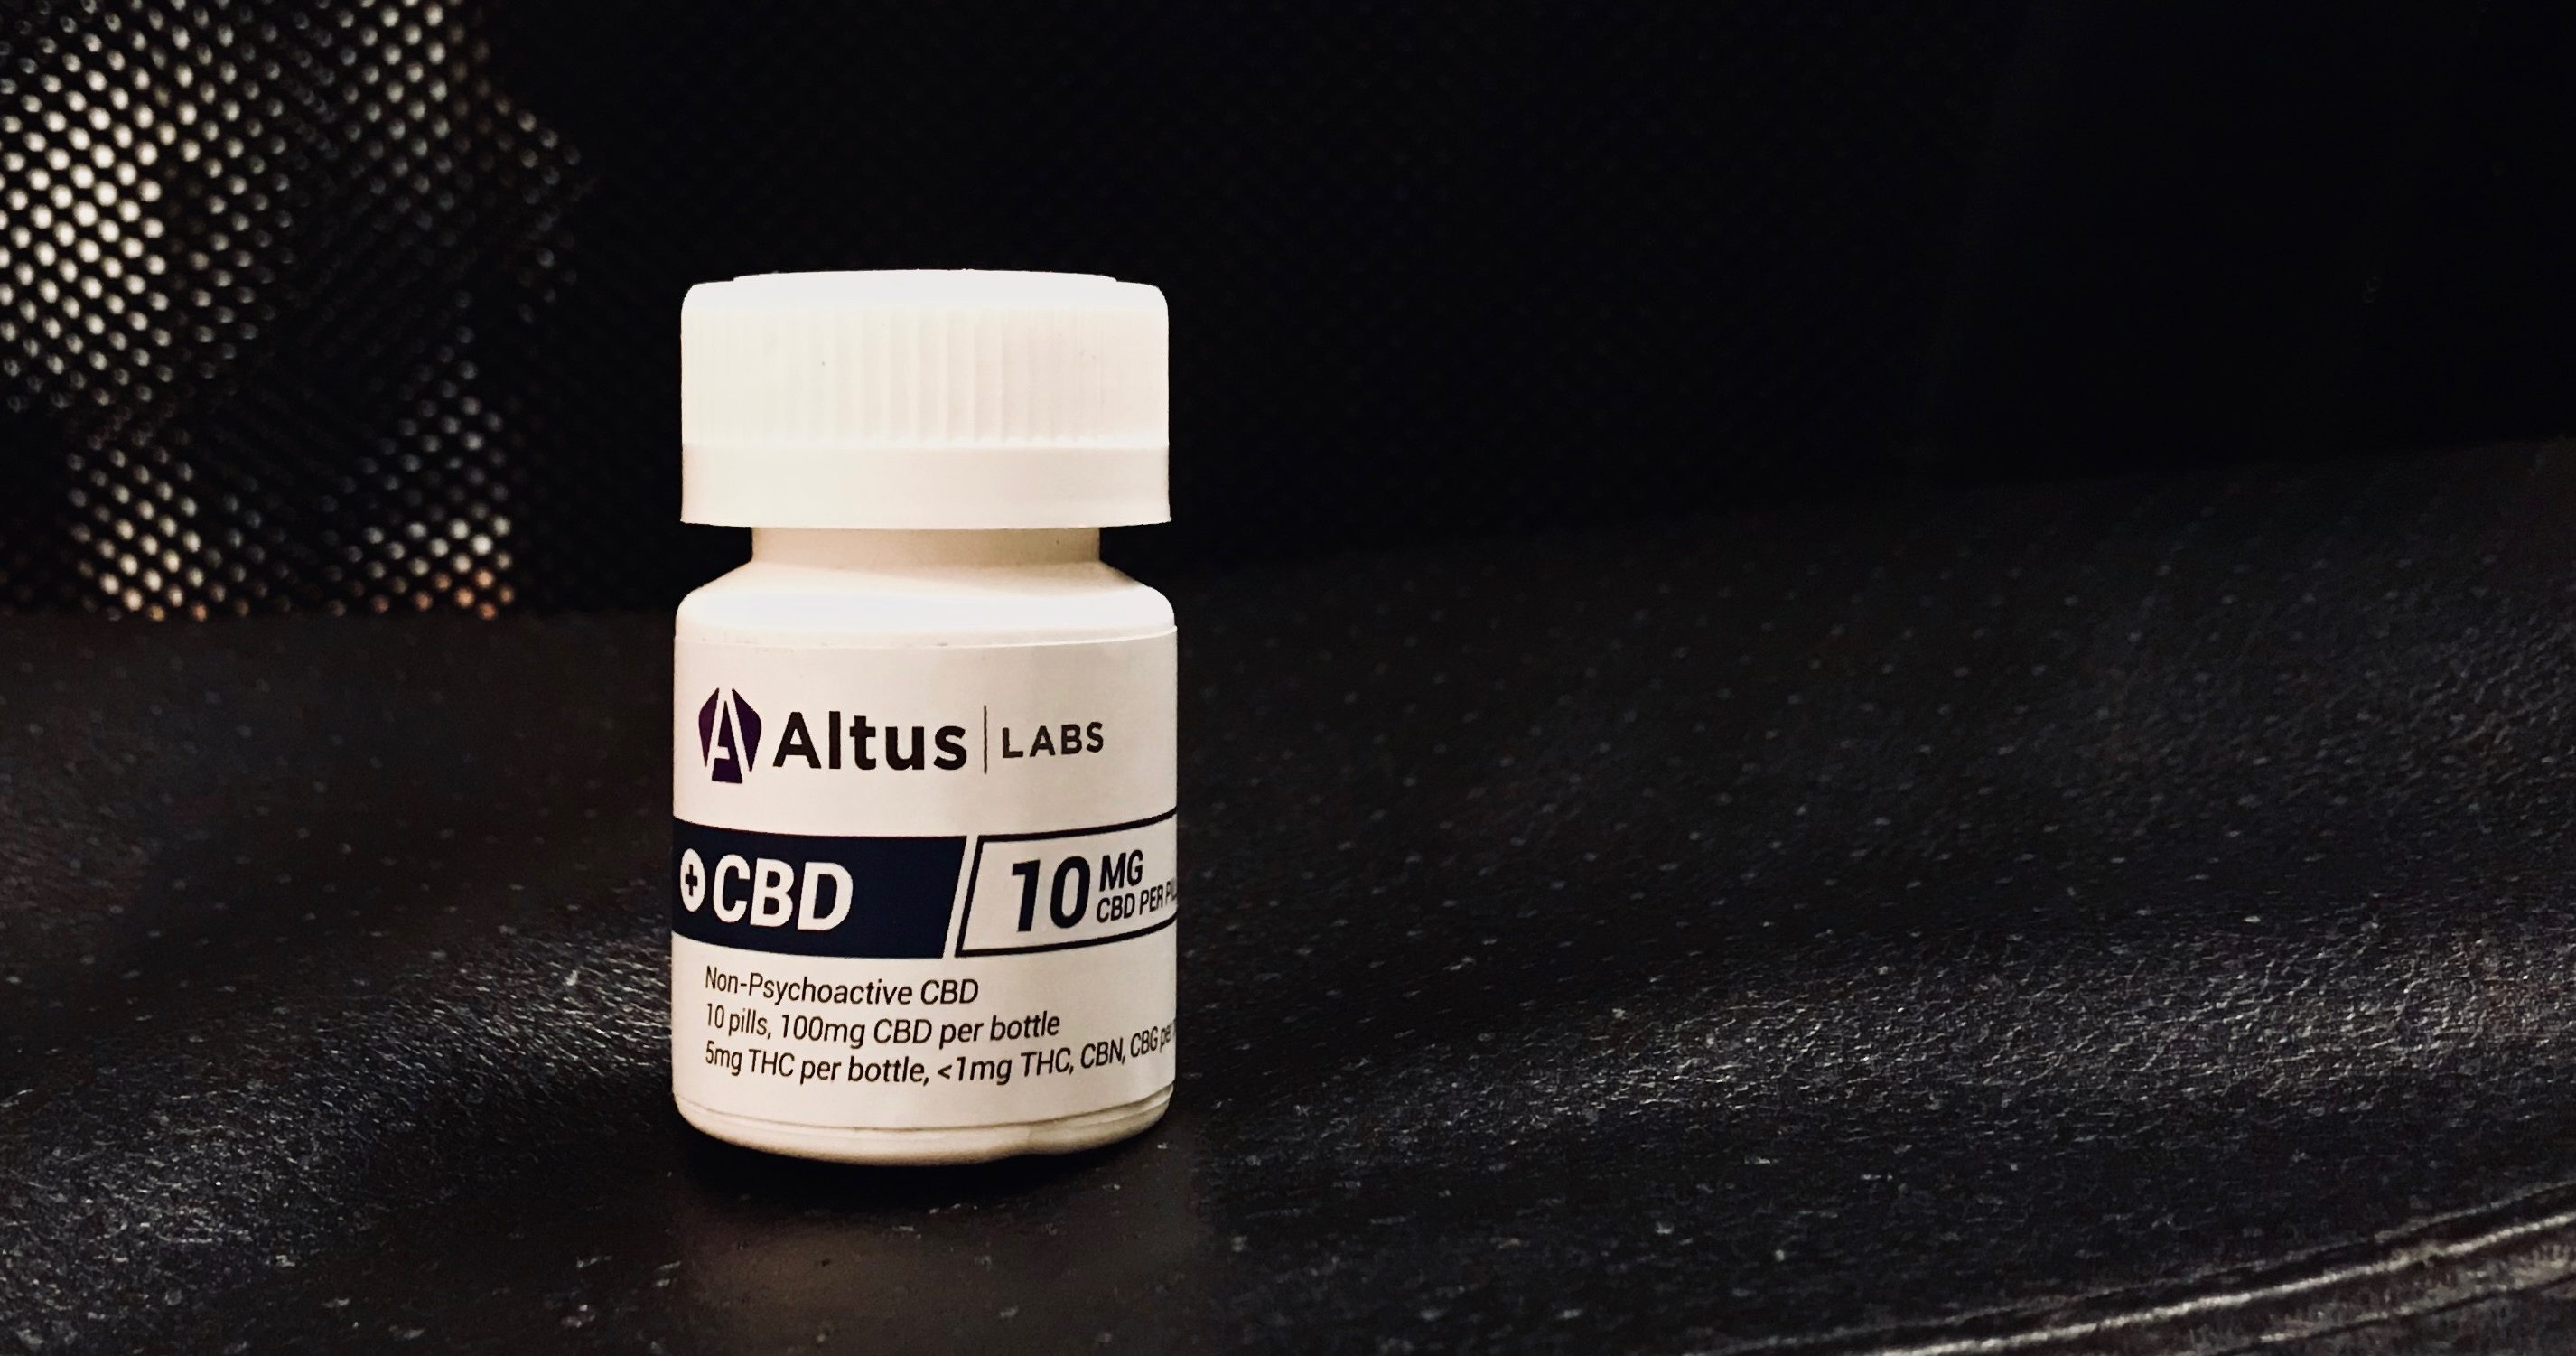 Altus Labs CBD Featured Image